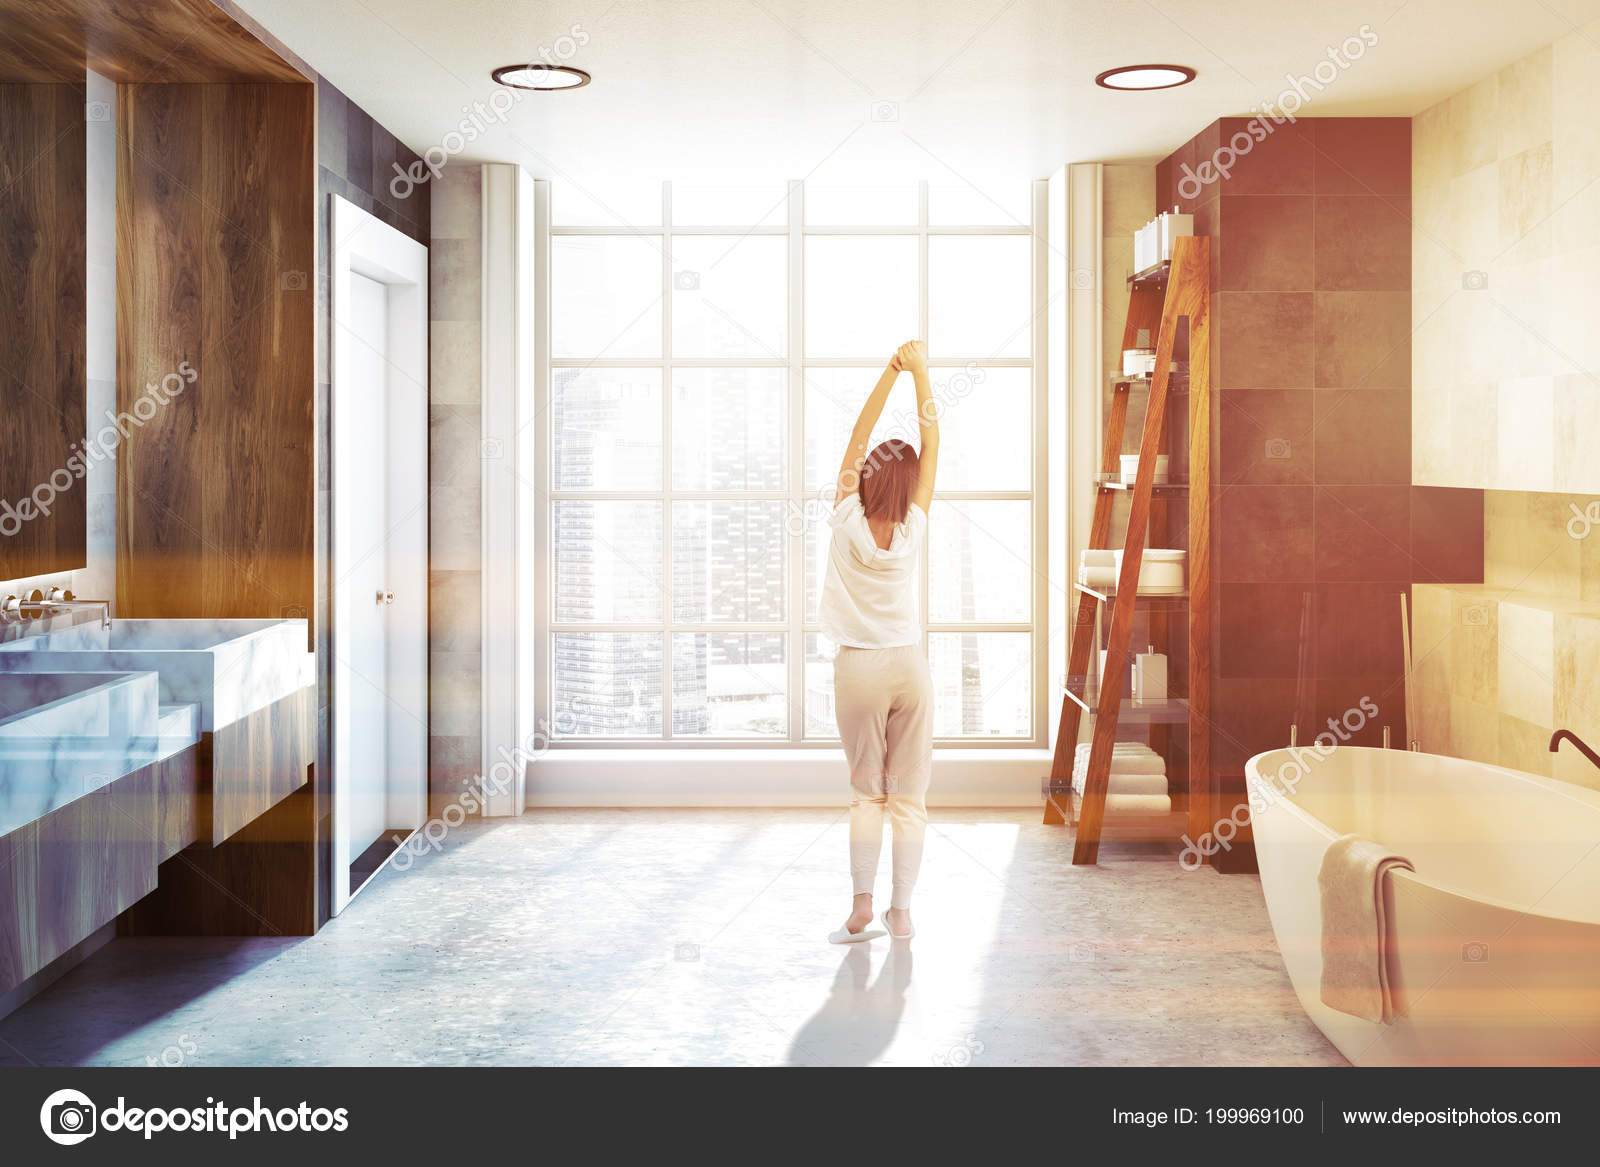 White Tiles Bathroom Interior Concrete Floor Large White Bathtub ...